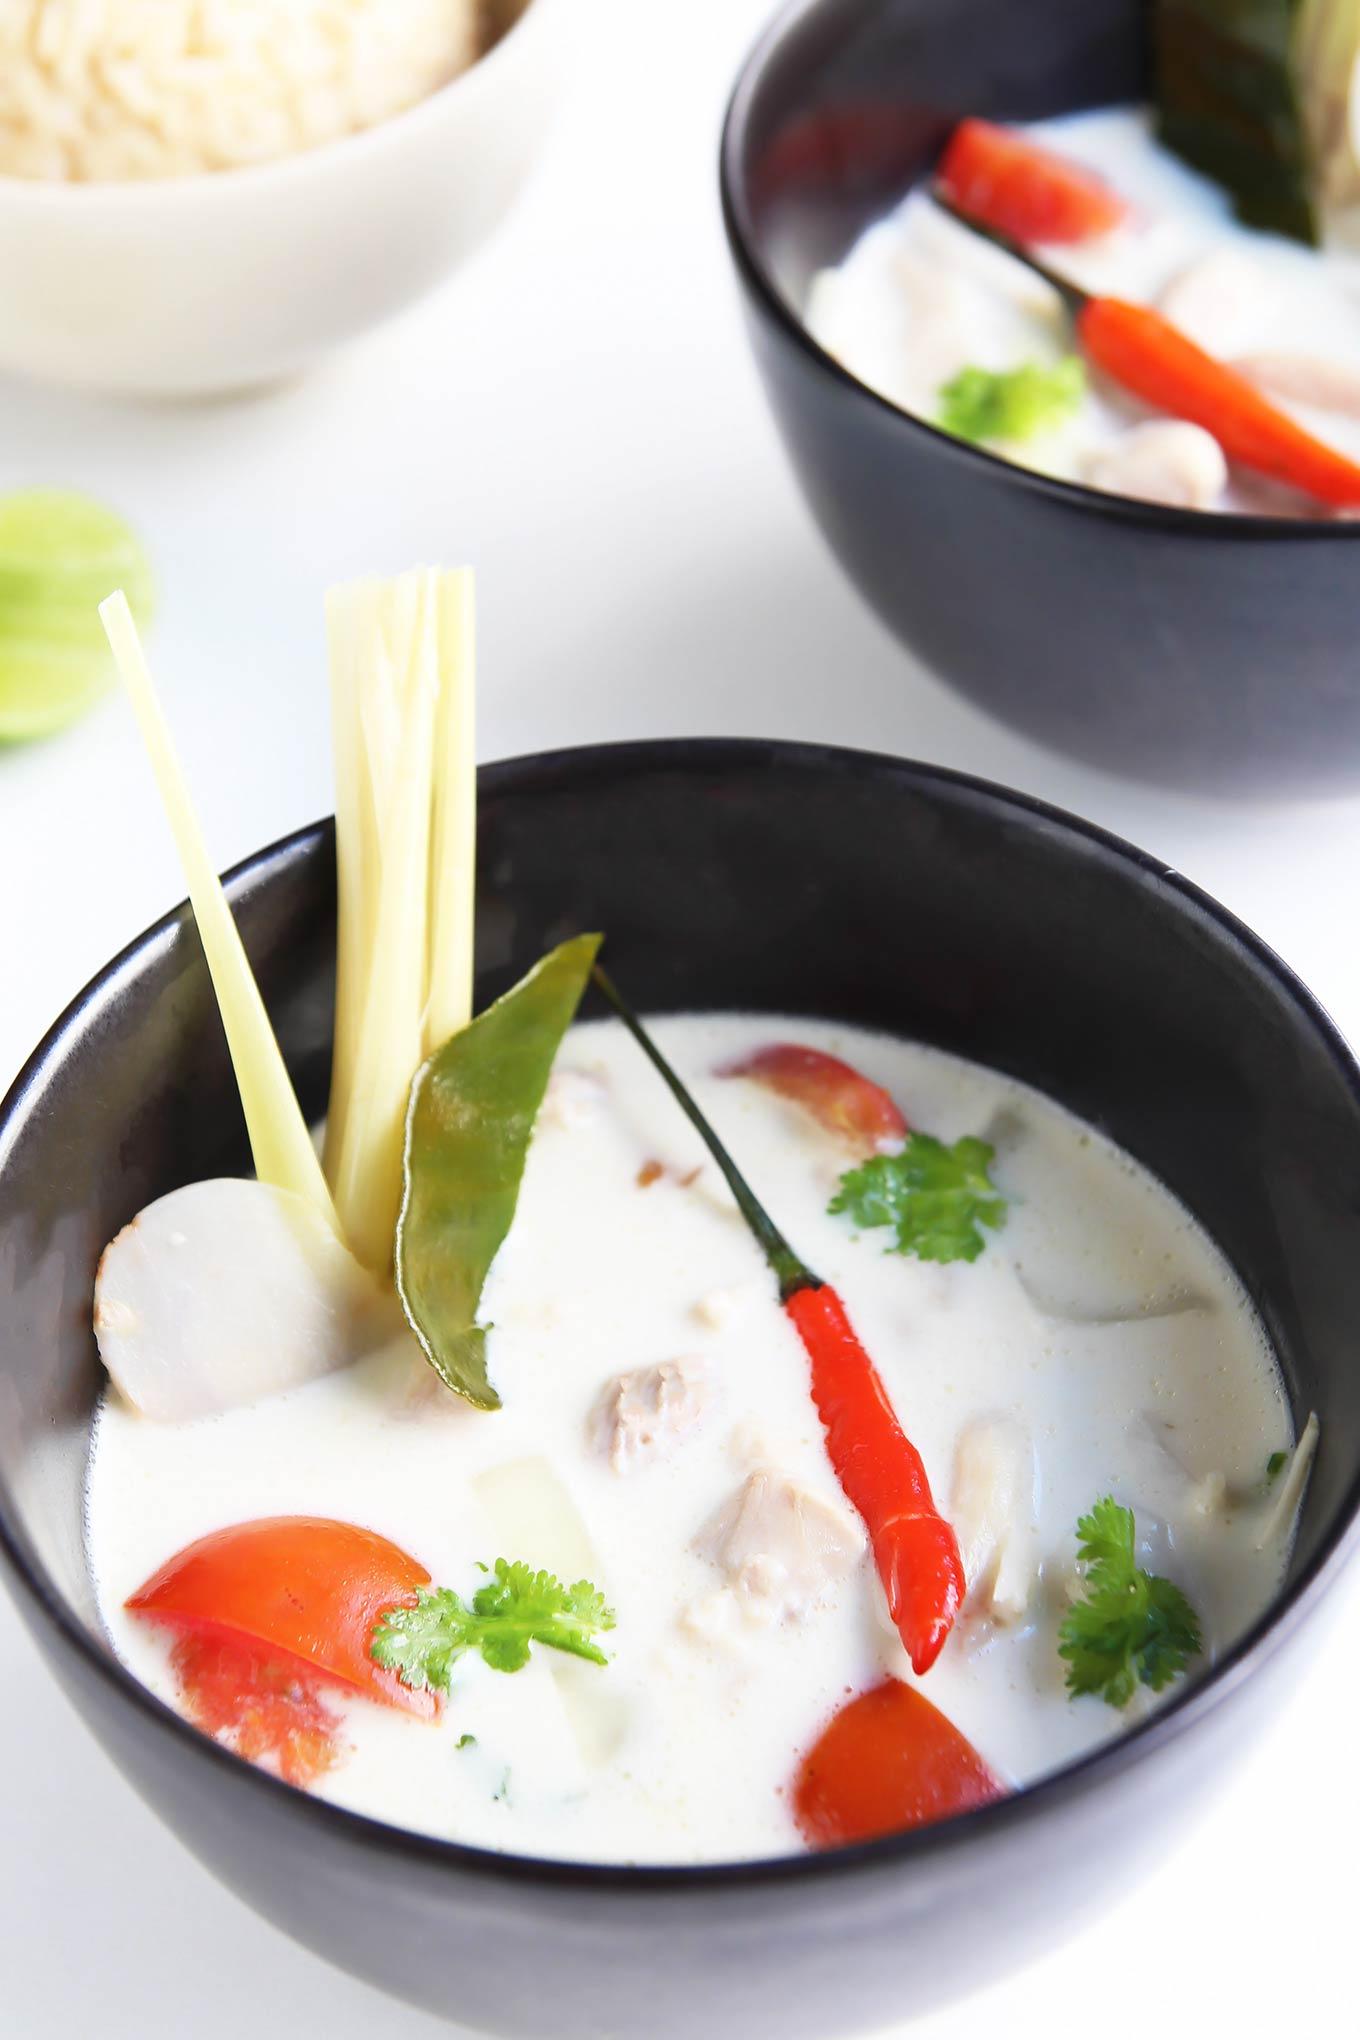 Bowl of Tom Kha Gai